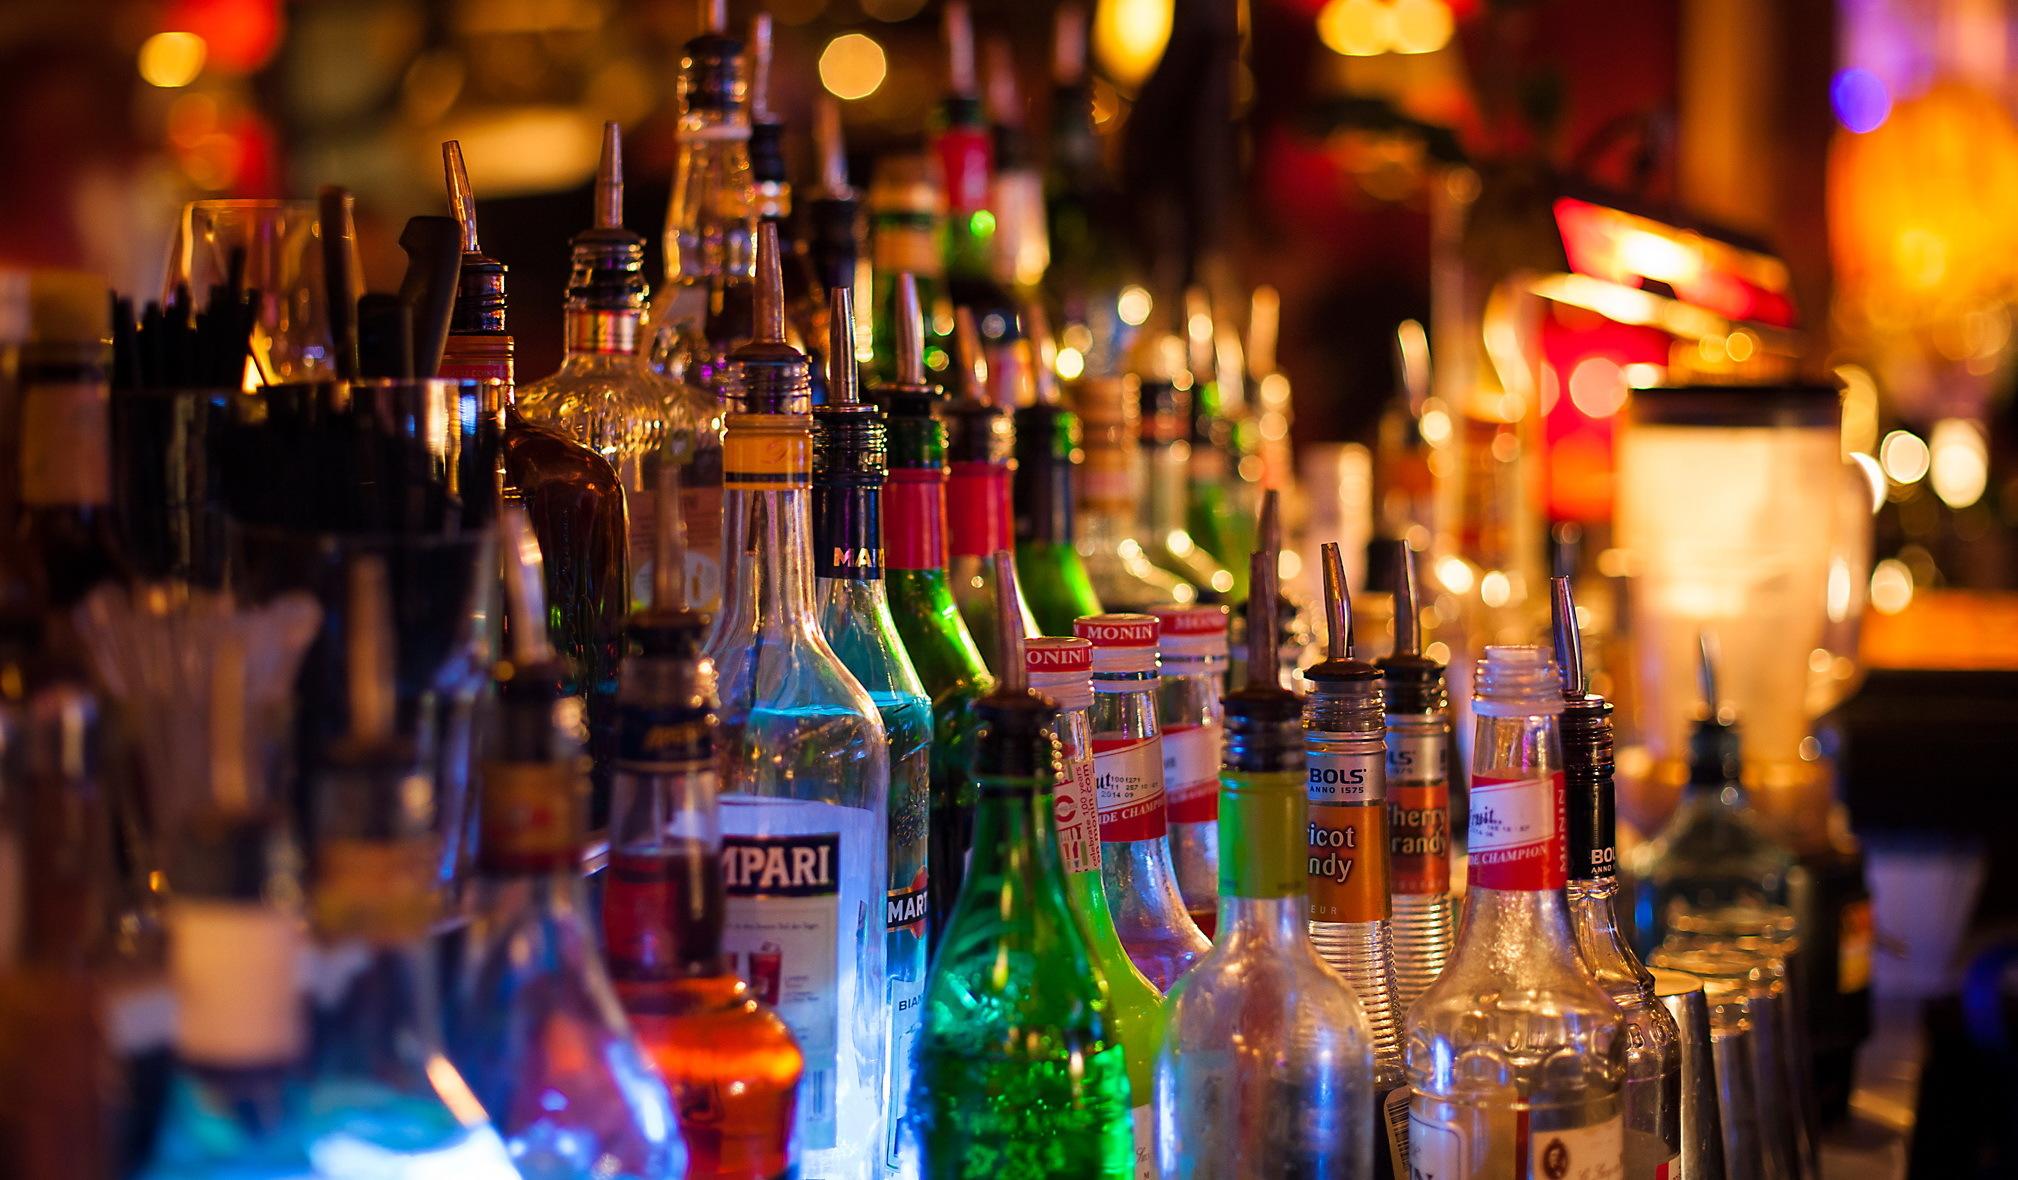 Днем смерти, картинки с баром